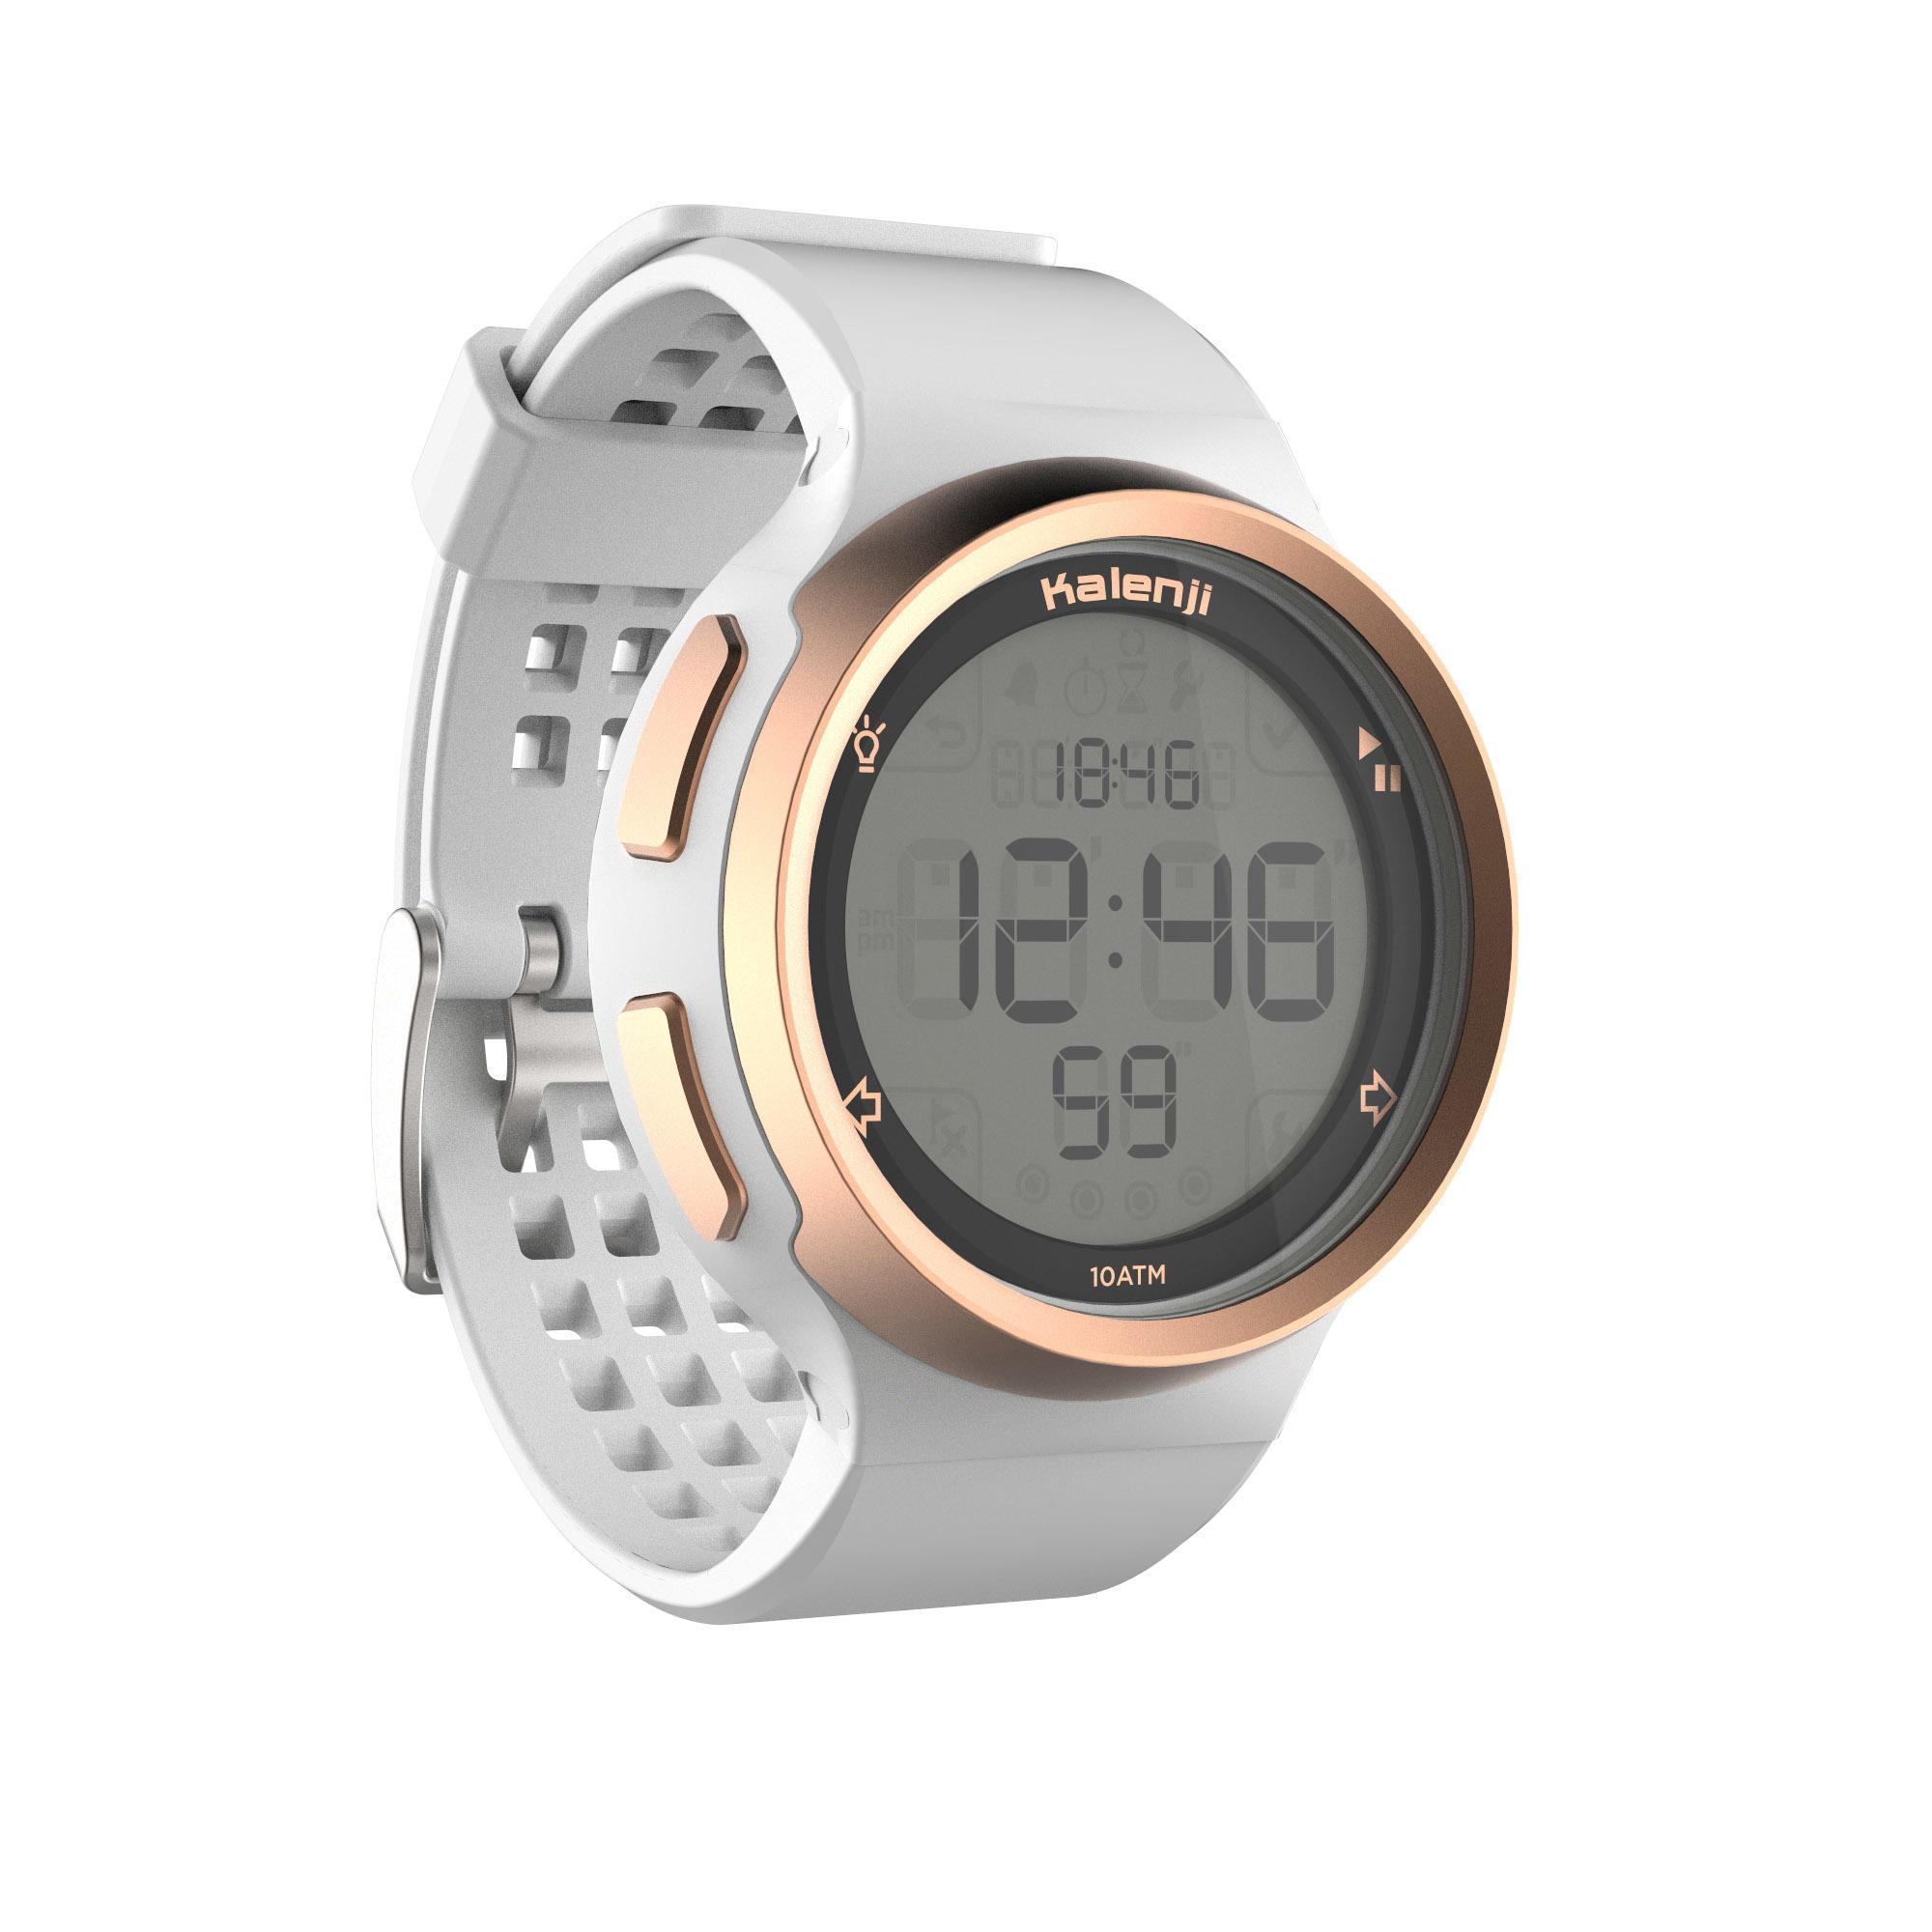 diseñador de moda 7ace0 efe75 Comprar Relojes de Running para Correr   Decathlon